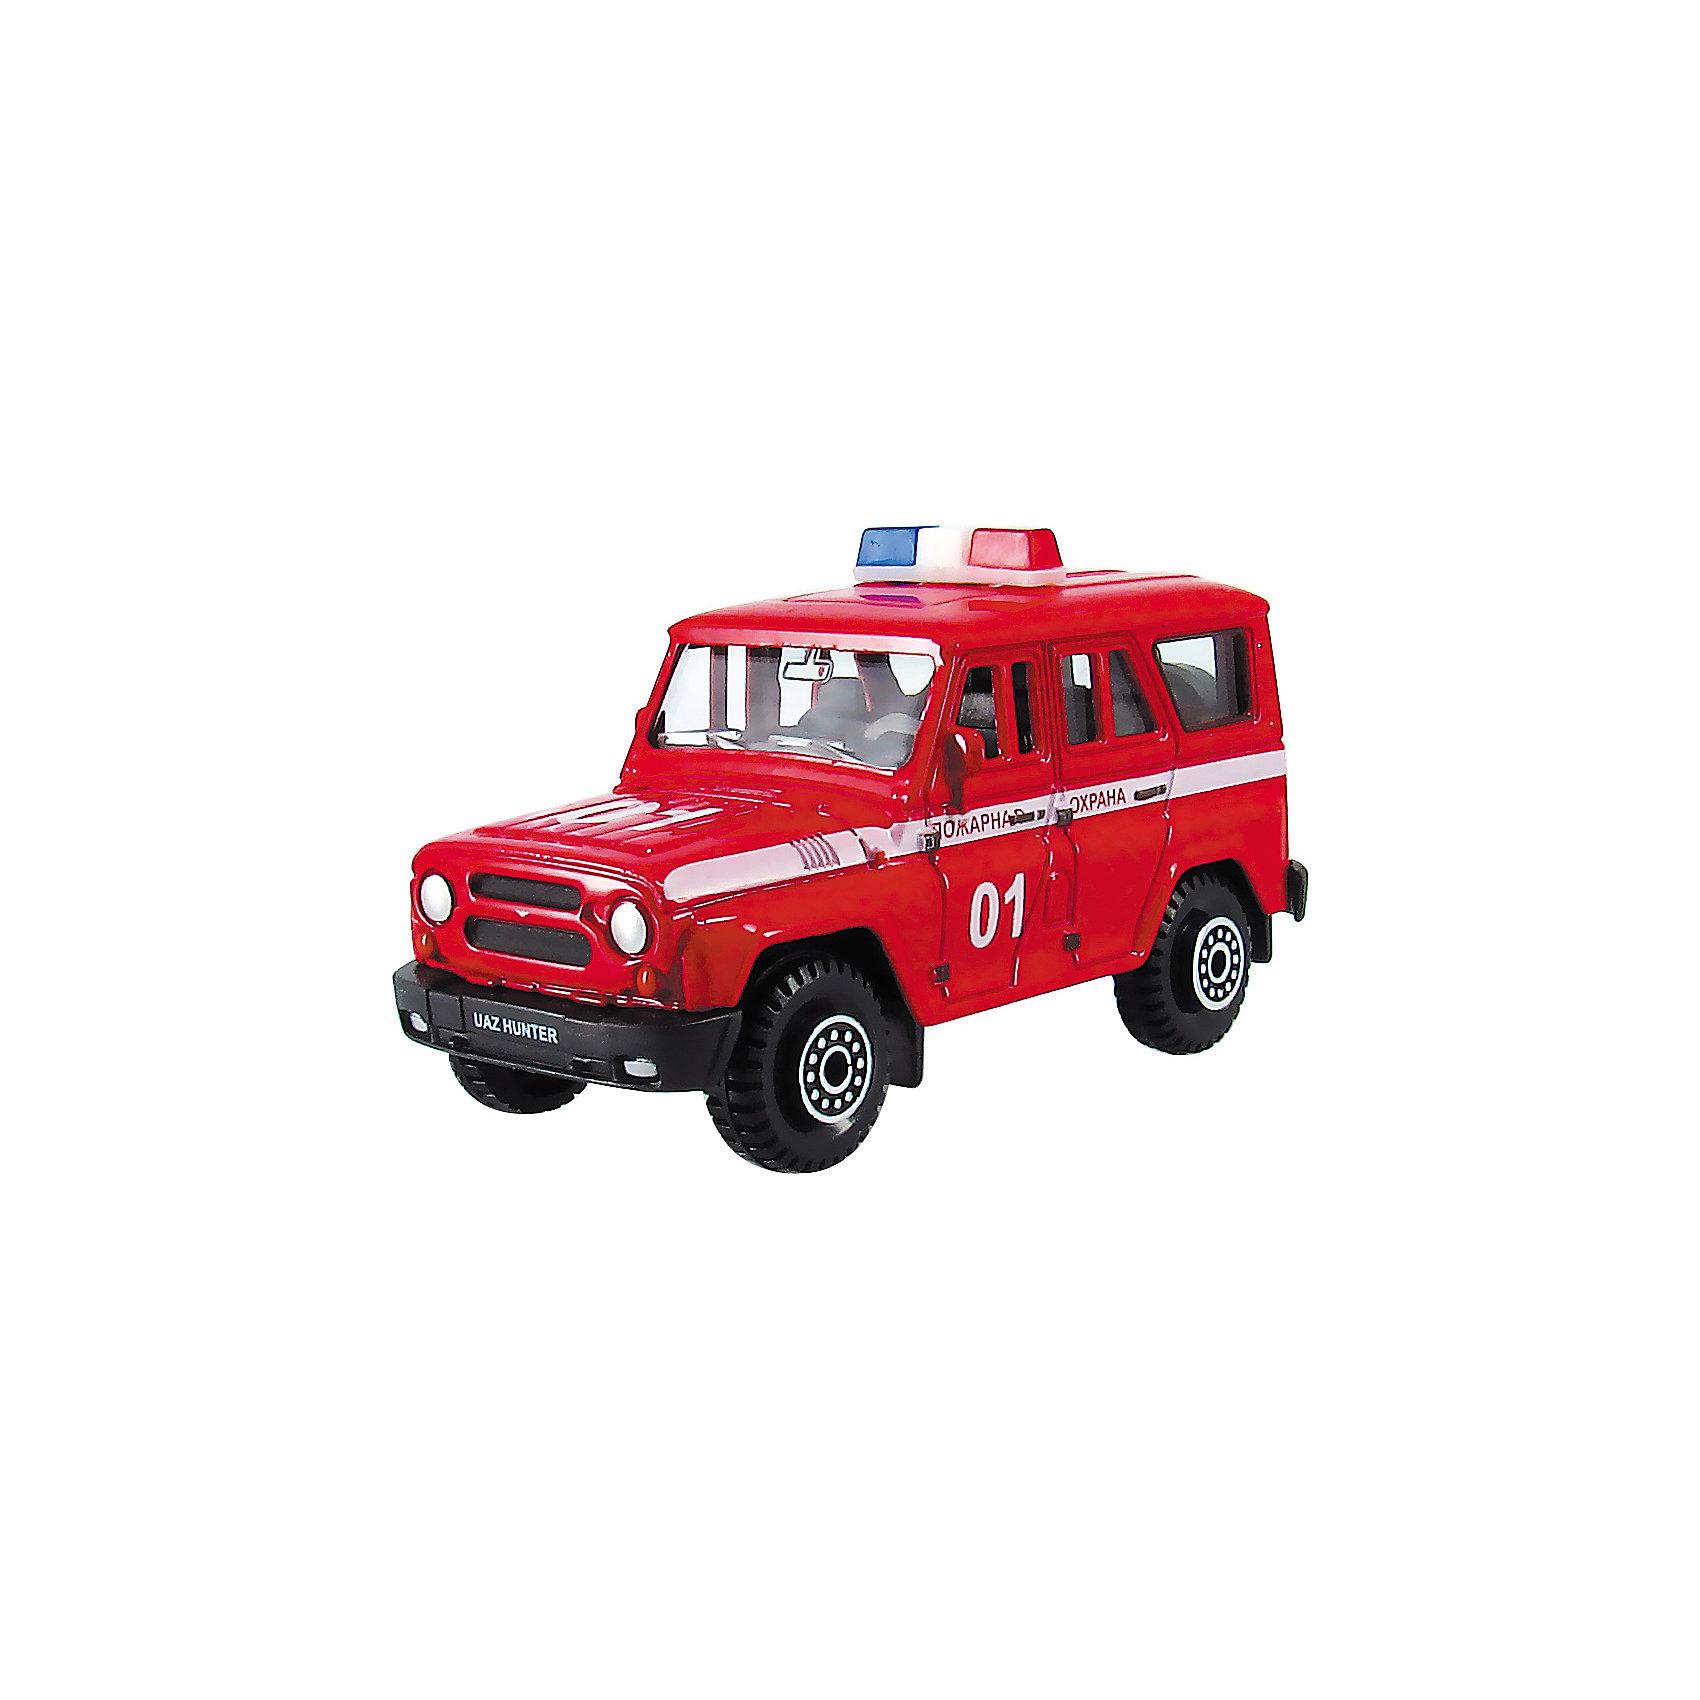 Машинка UAZ Hunter пожарная охрана 1:60, AutotimeМашинки<br><br><br>Ширина мм: 100<br>Глубина мм: 40<br>Высота мм: 40<br>Вес г: 16<br>Возраст от месяцев: 36<br>Возраст до месяцев: 2147483647<br>Пол: Мужской<br>Возраст: Детский<br>SKU: 5584018